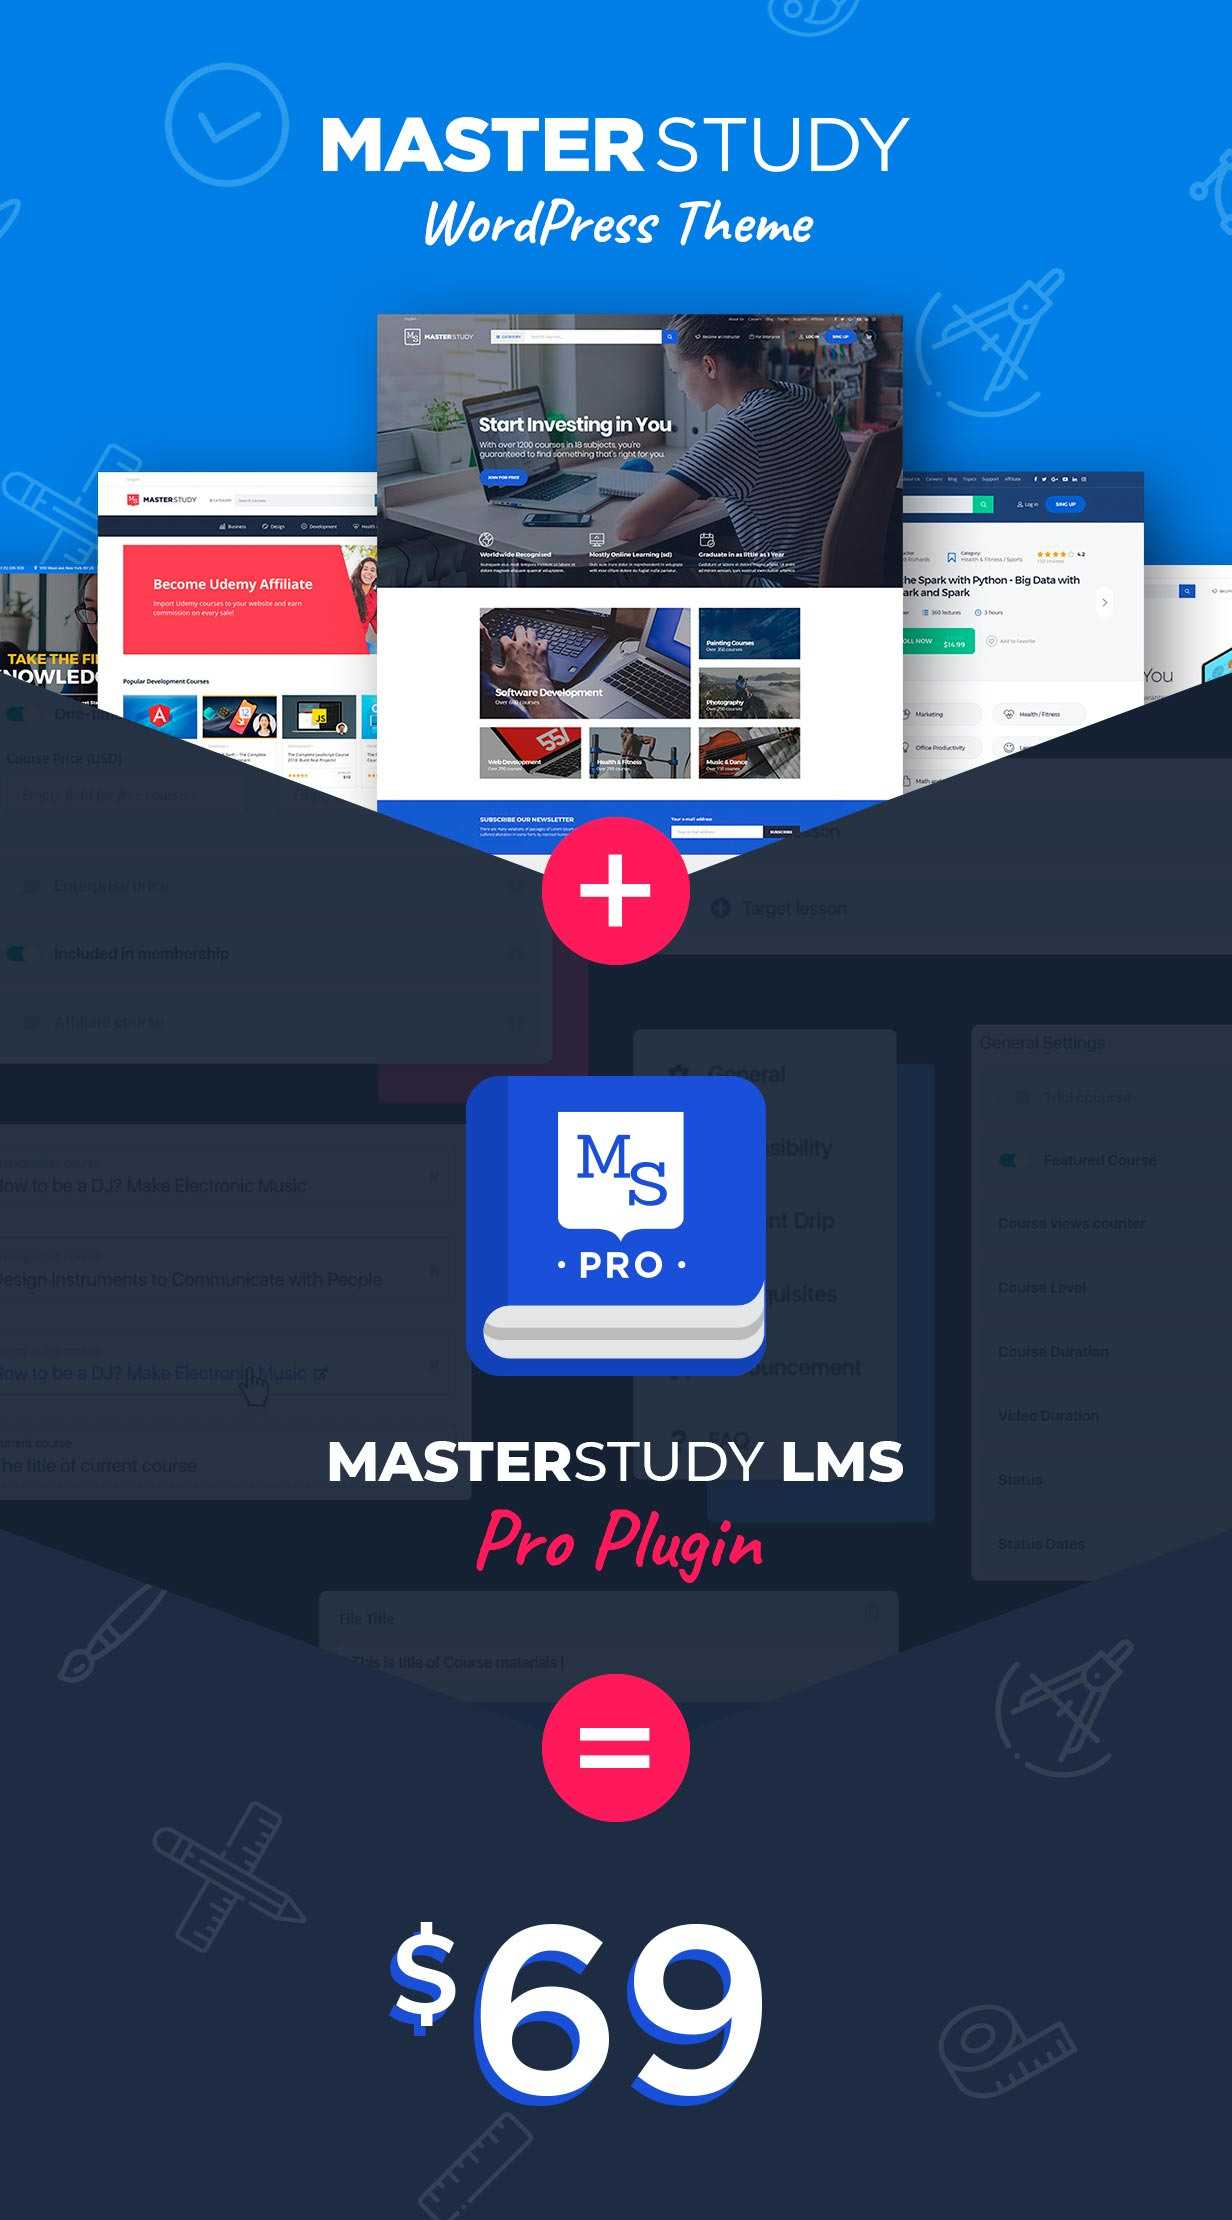 ms lms - Education WordPress Theme - Masterstudy